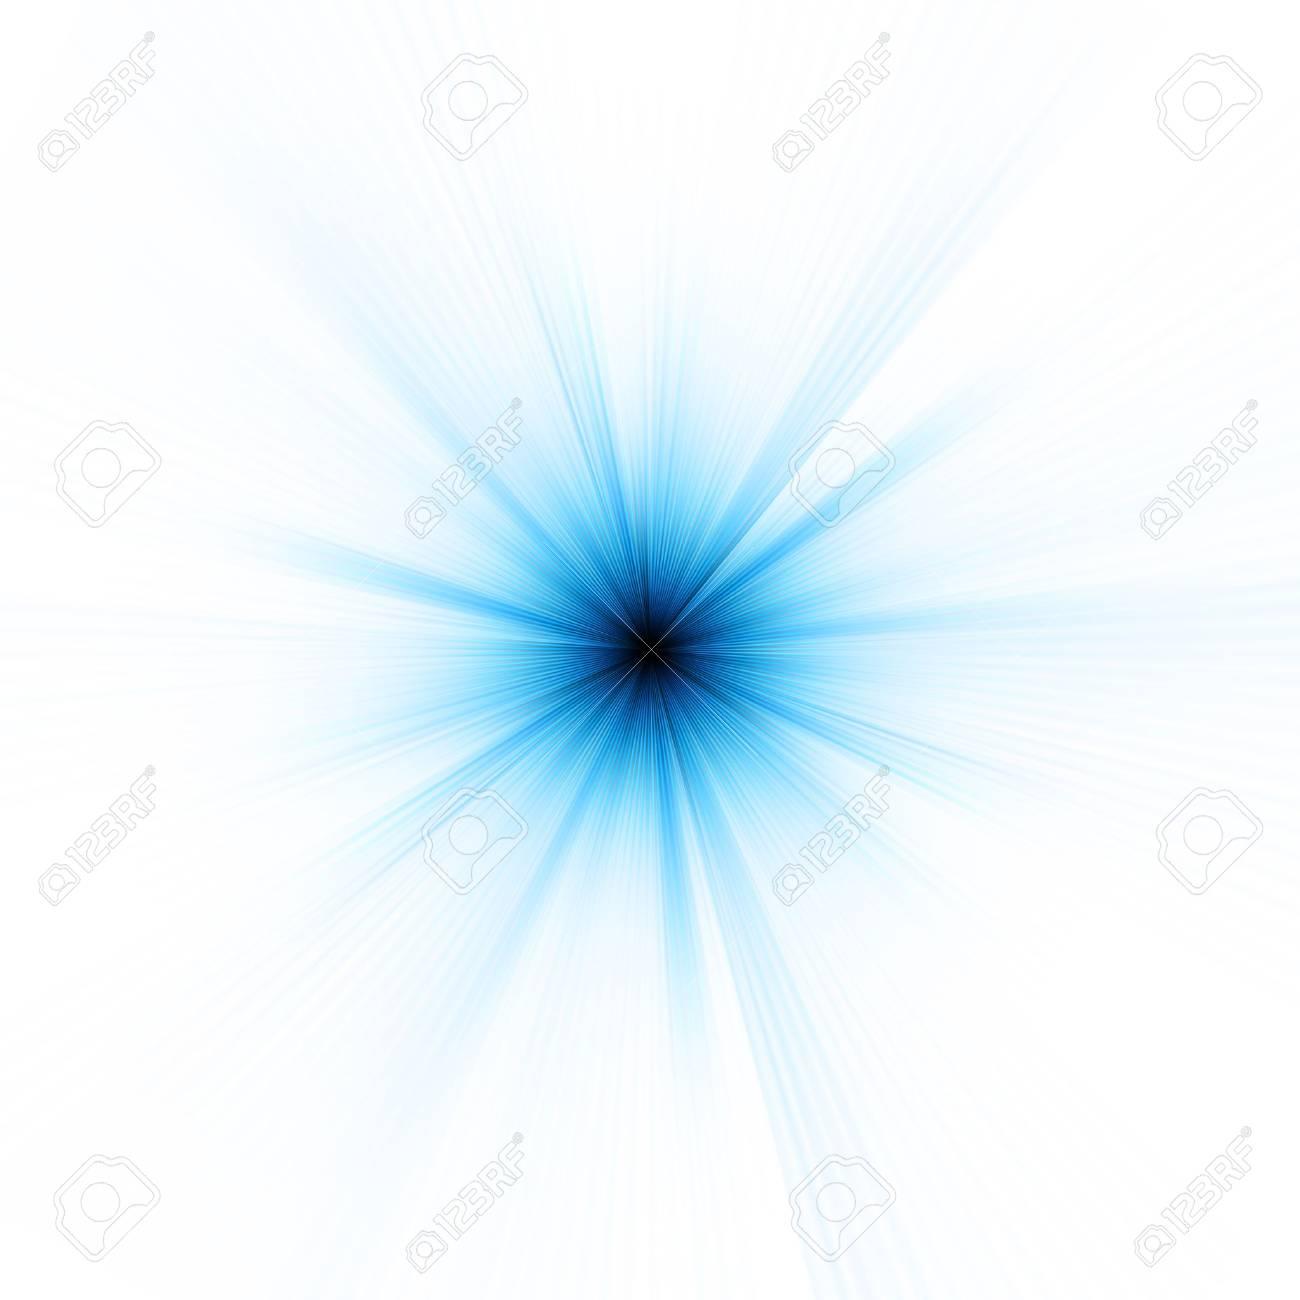 Abstract burst on white Stock Photo - 17593542